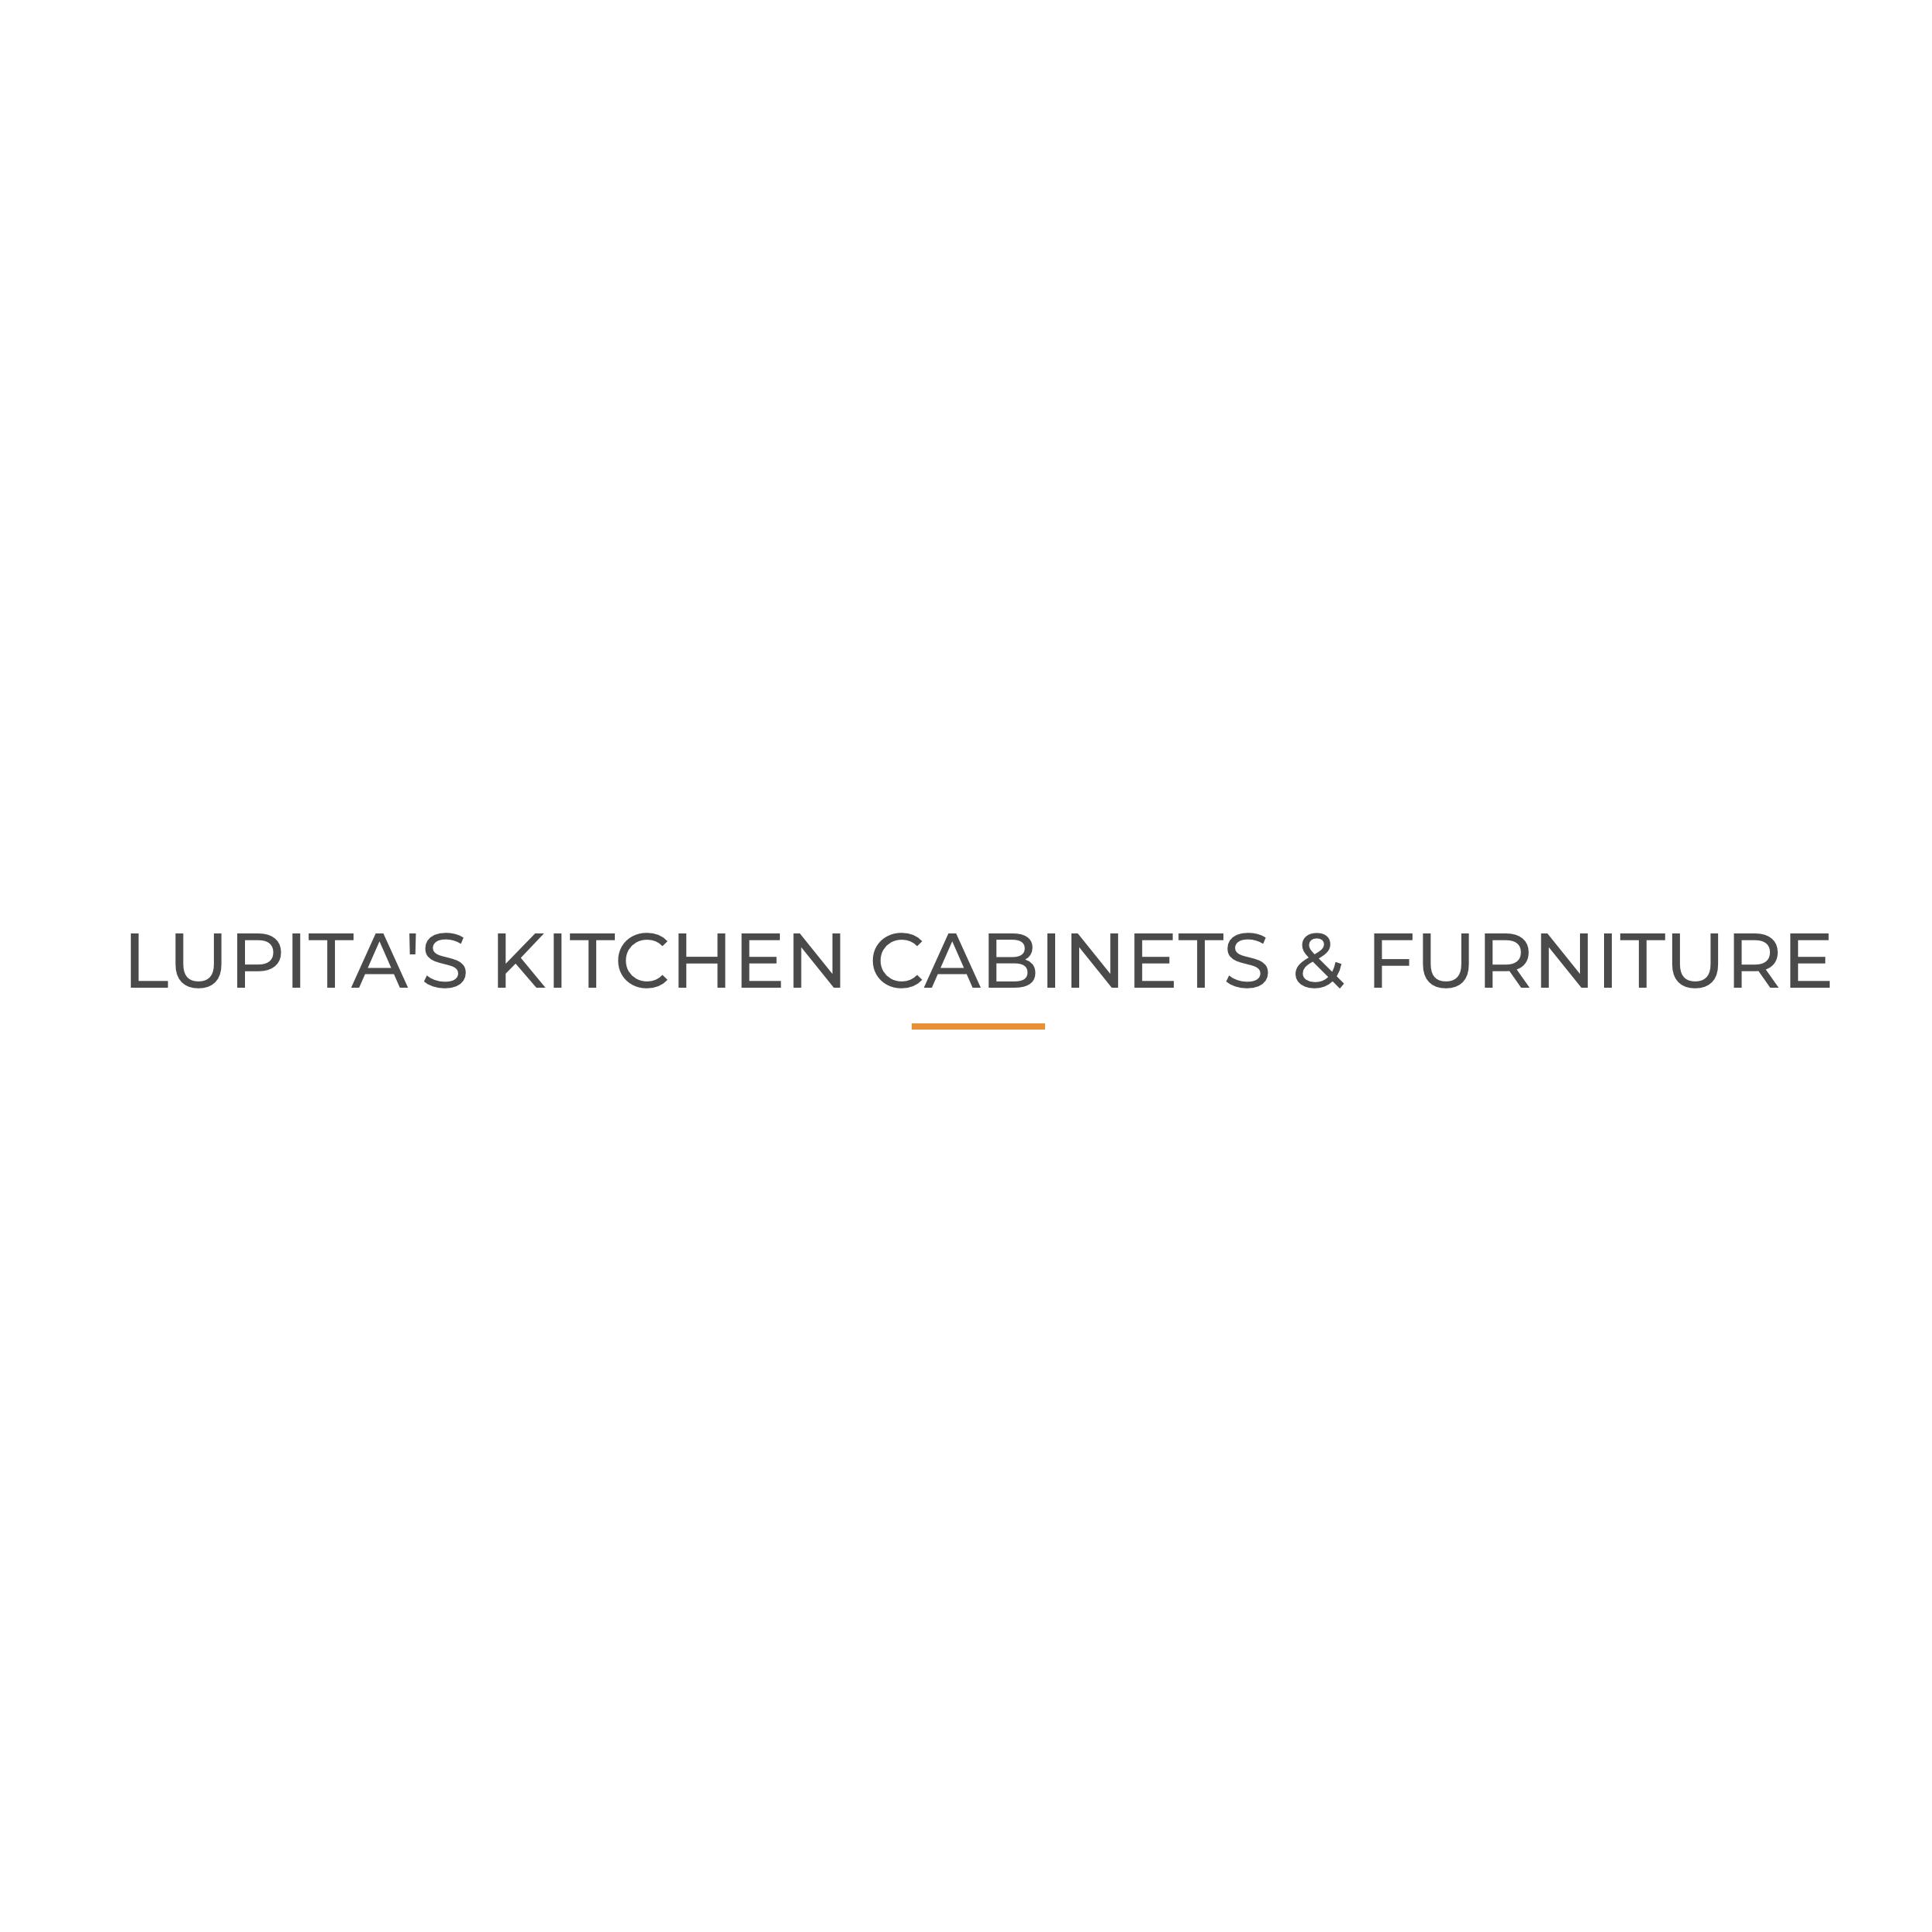 Lupita's Furniture